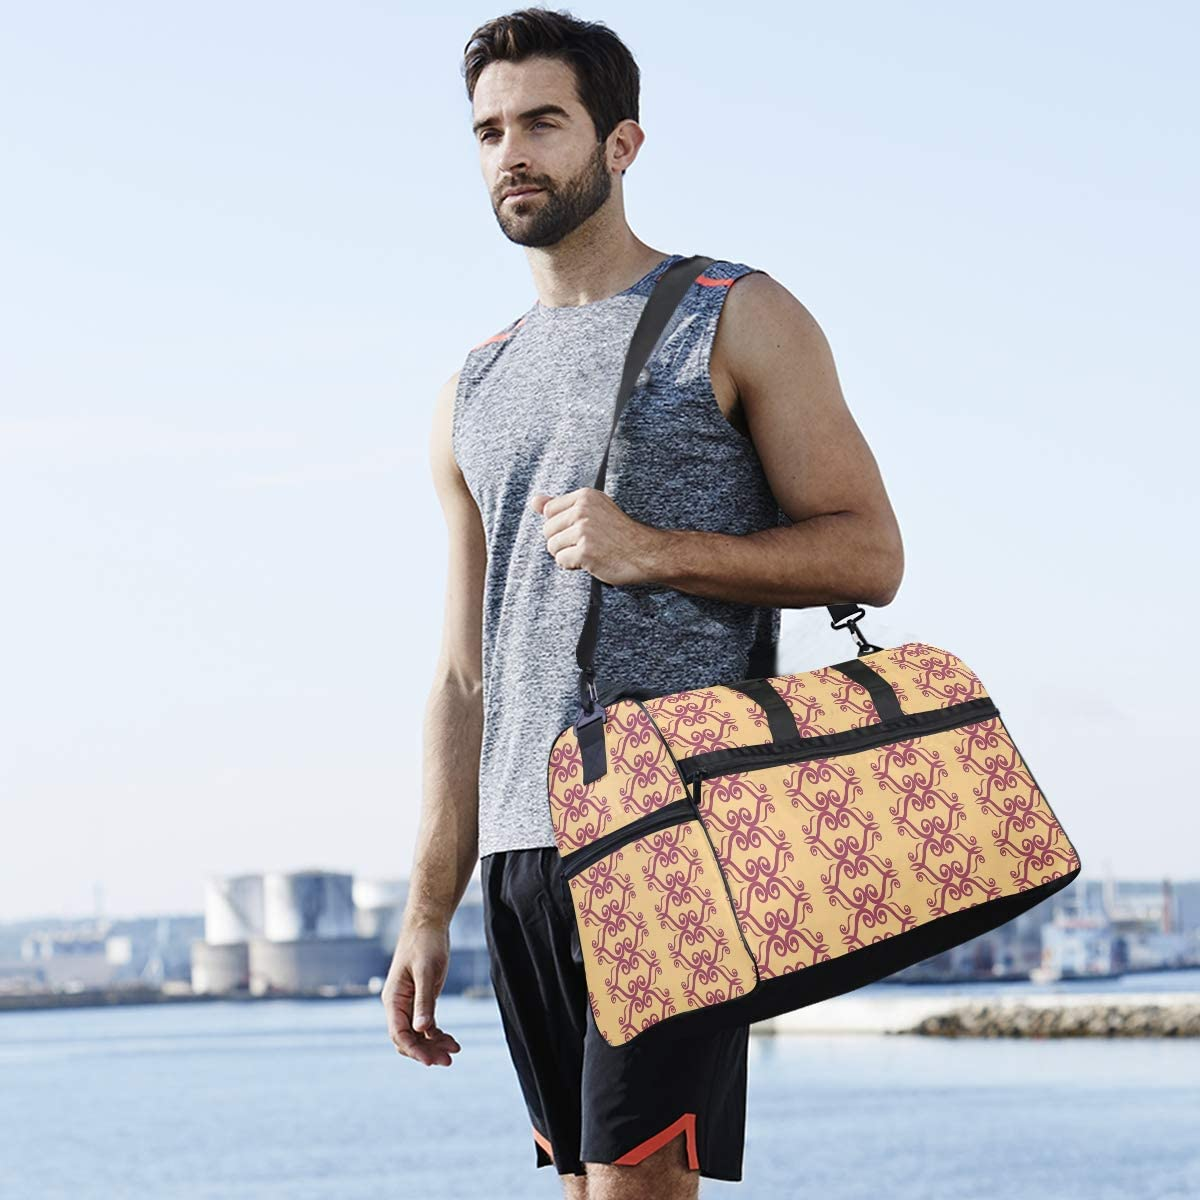 Travel Duffels Modern Vintage1 Duffle Bag Luggage Sports Gym for Women /& Men